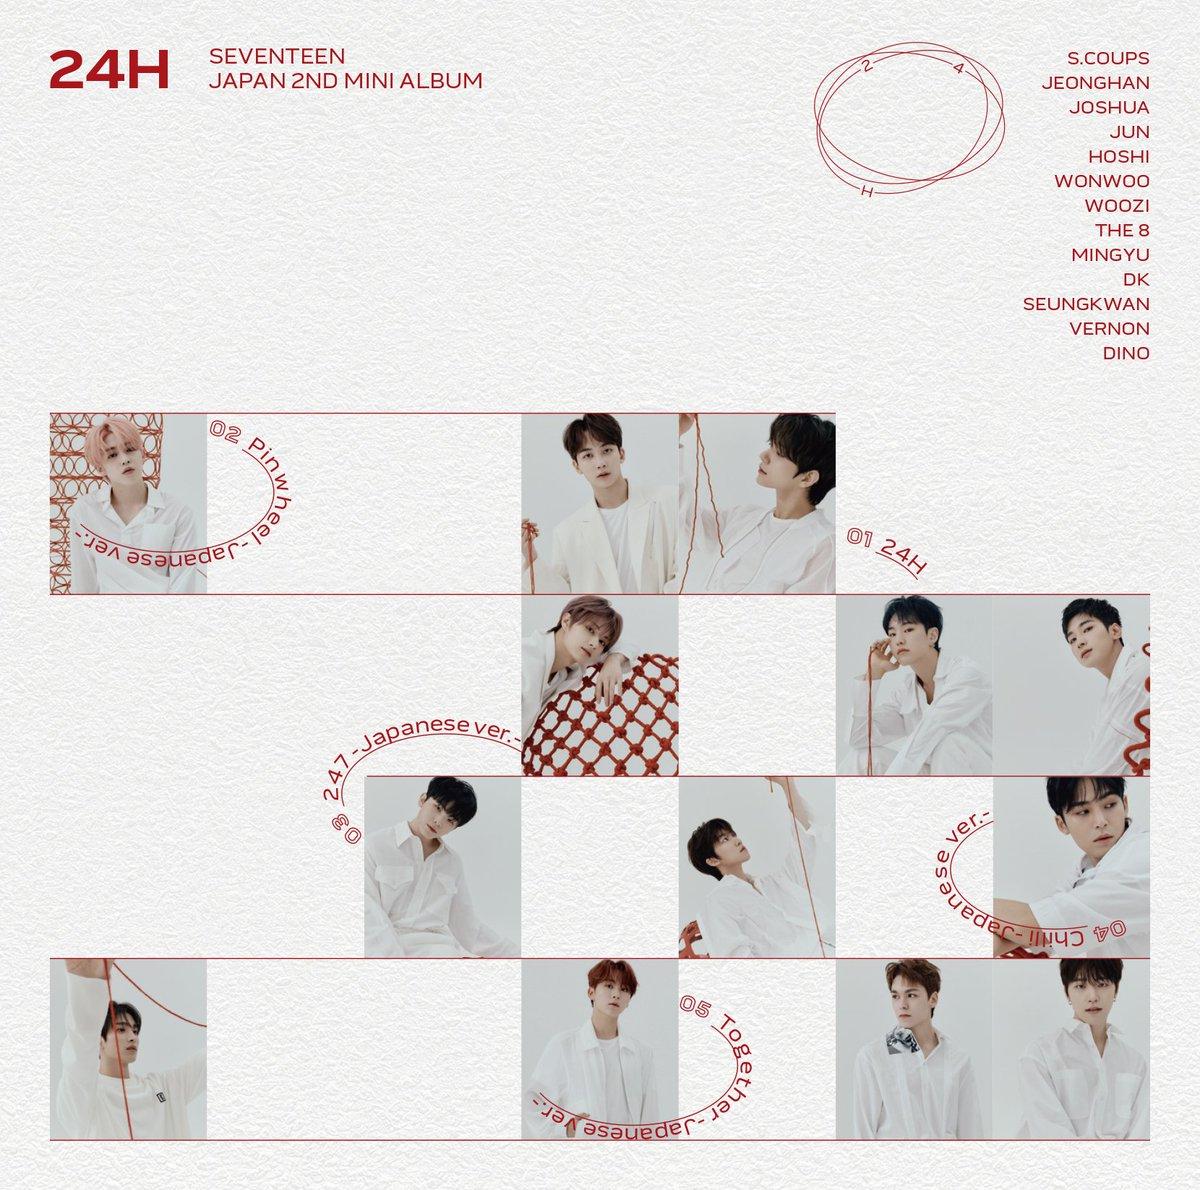 『SEVENTEEN - Pinwheel -Japanese ver.-』収録の『24H』ジャケット